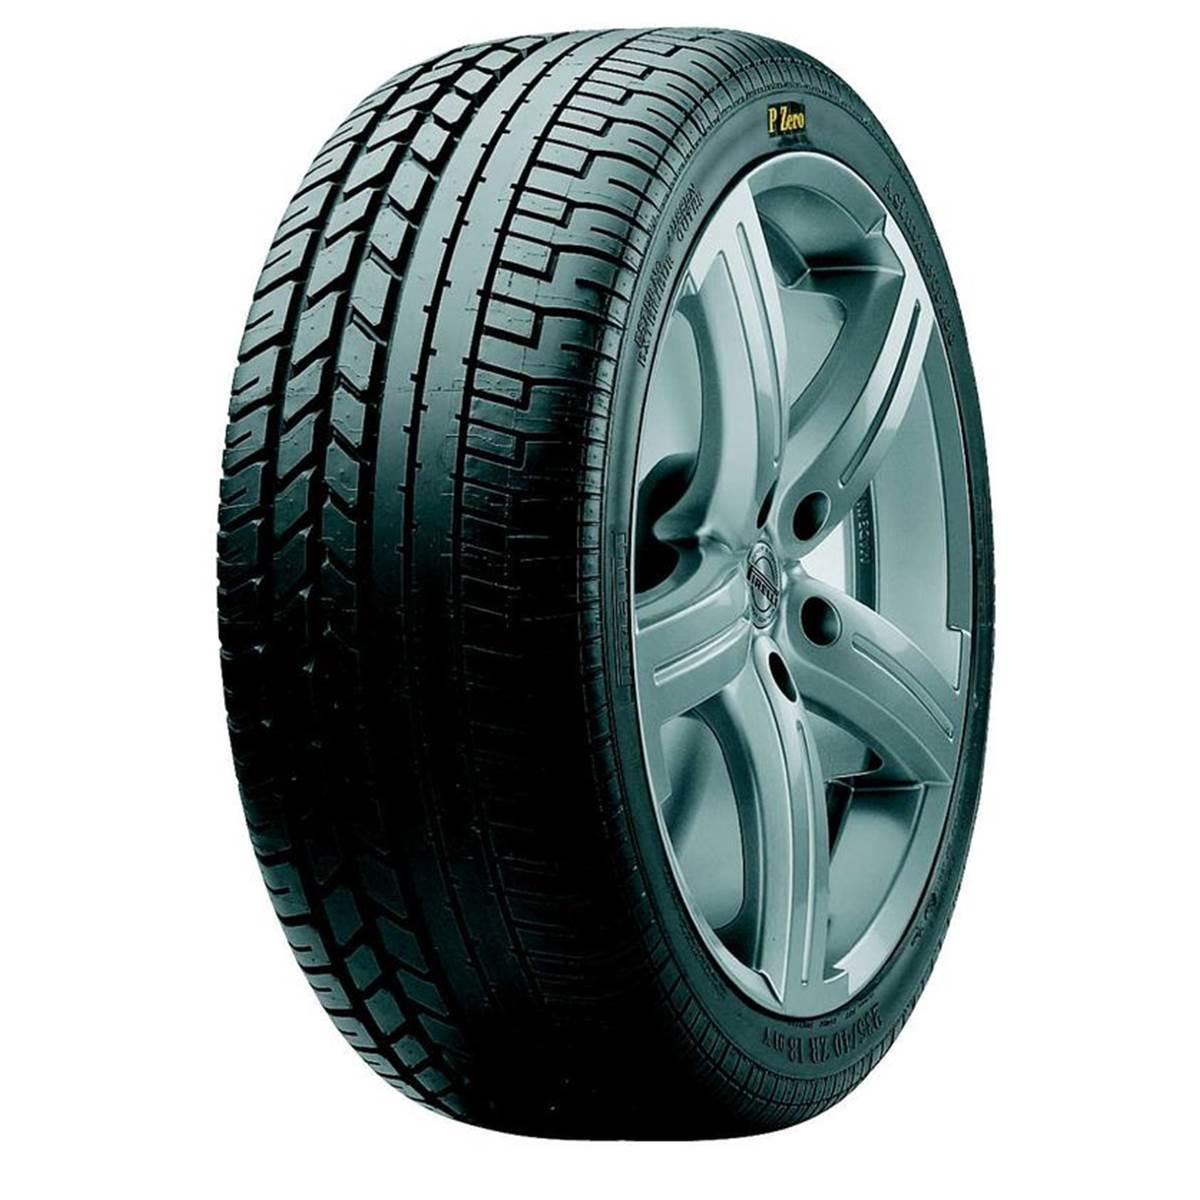 Pneu Pirelli 205/50R15 86W Pzero Rosso Asimmetrico